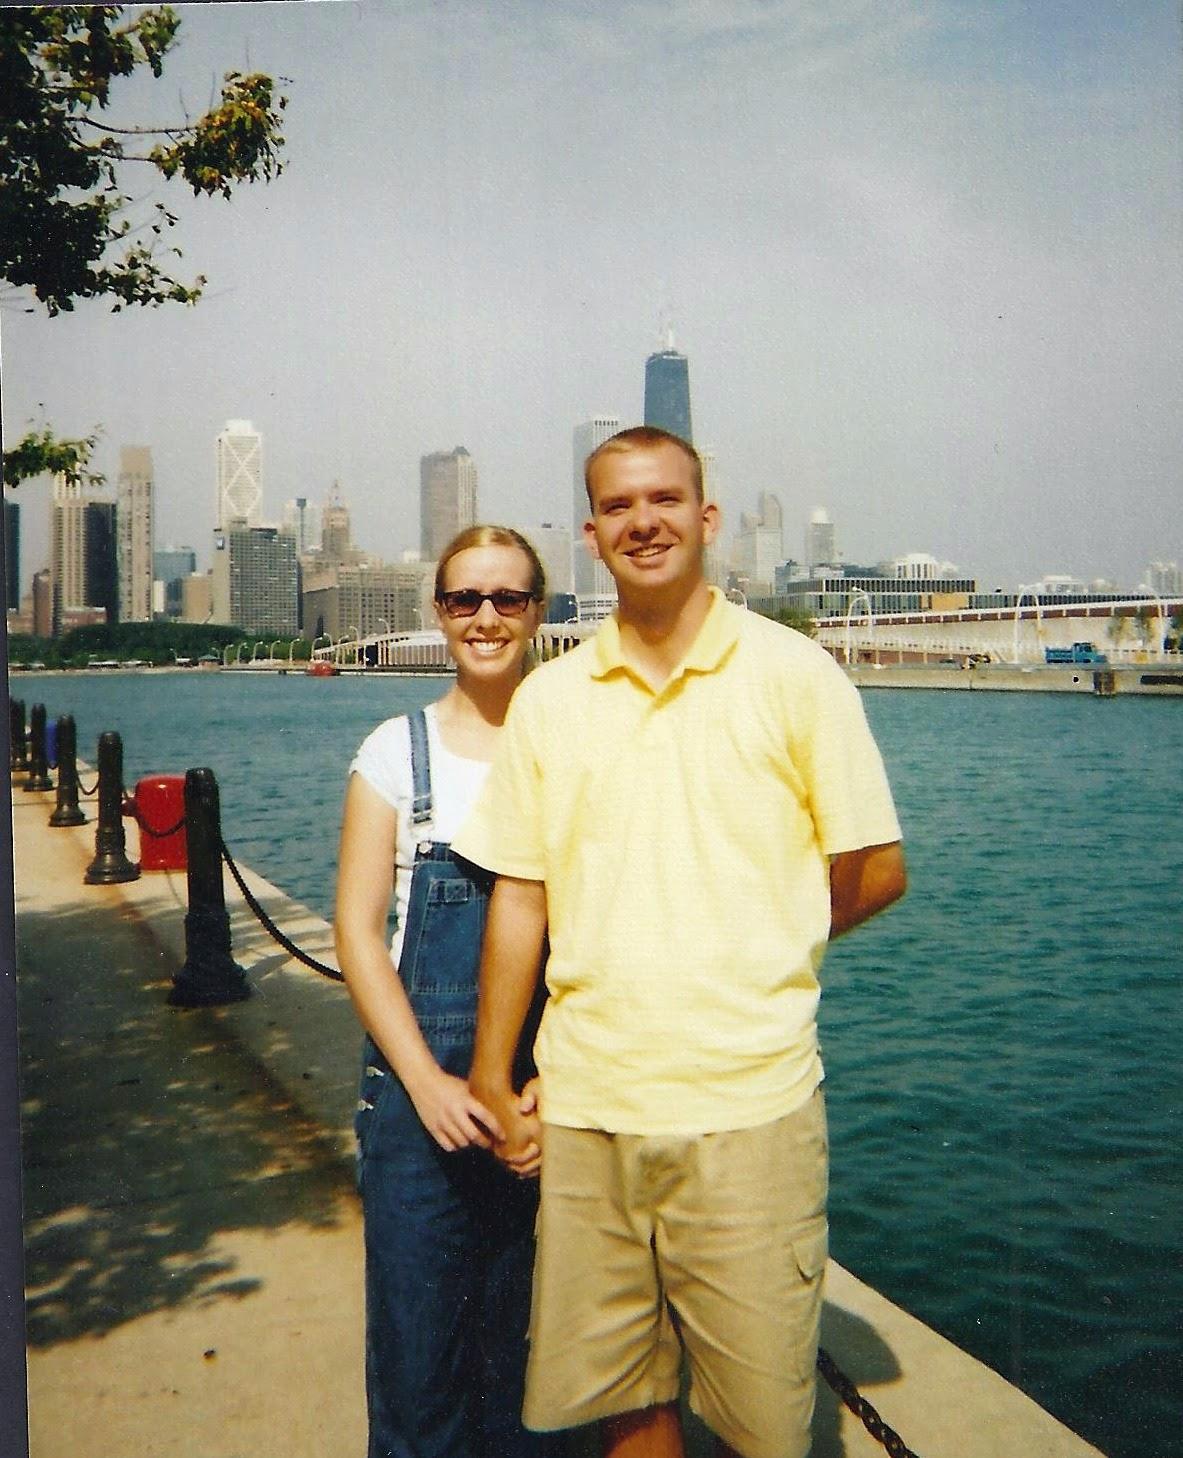 Chicago, Illinois 2002